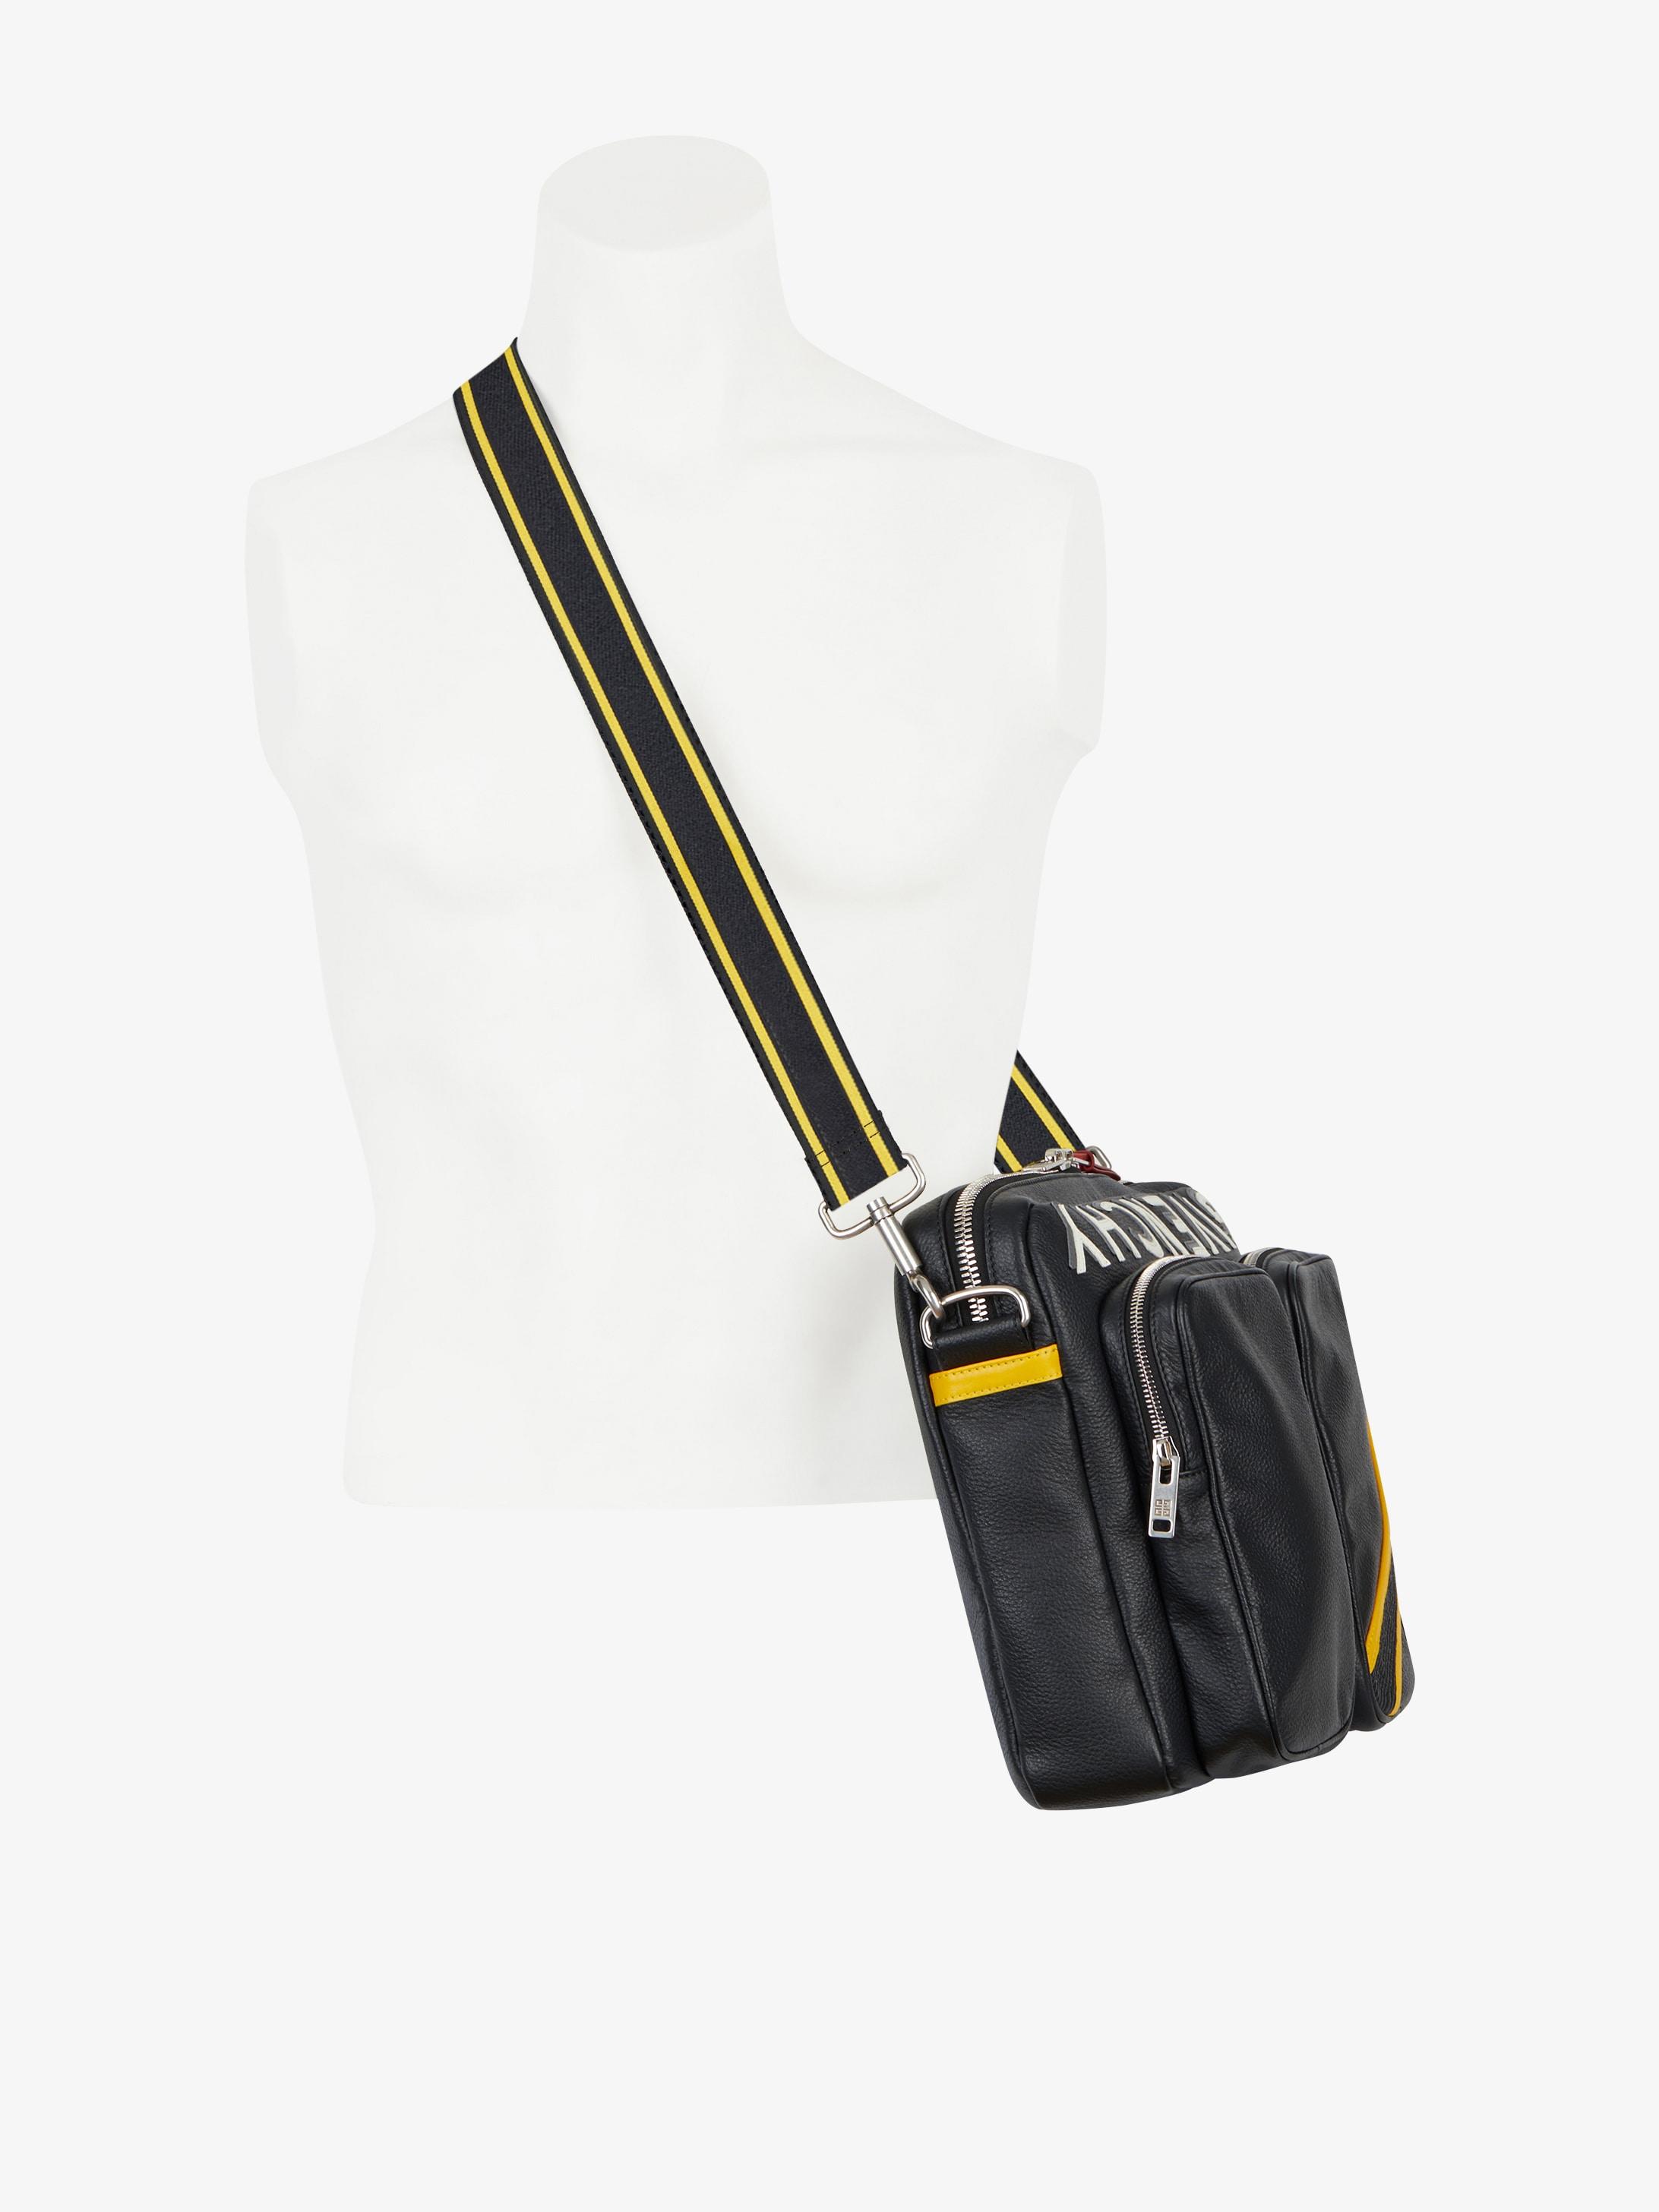 Reverse Givenchy messenger bag